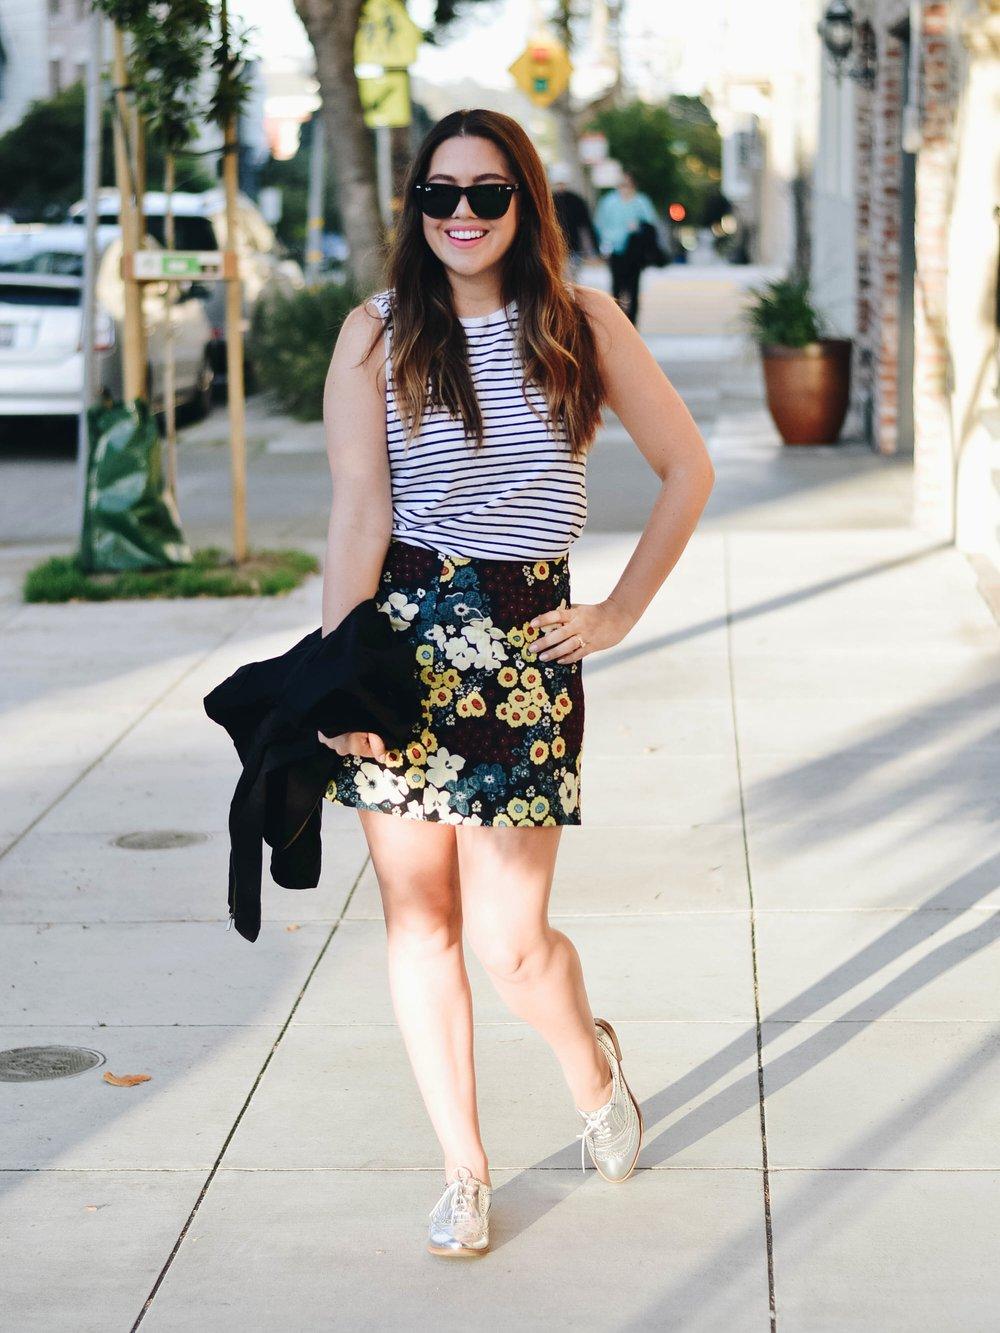 4 New Shoe Styles to Strut into Summer via. www.birdieshoots.com